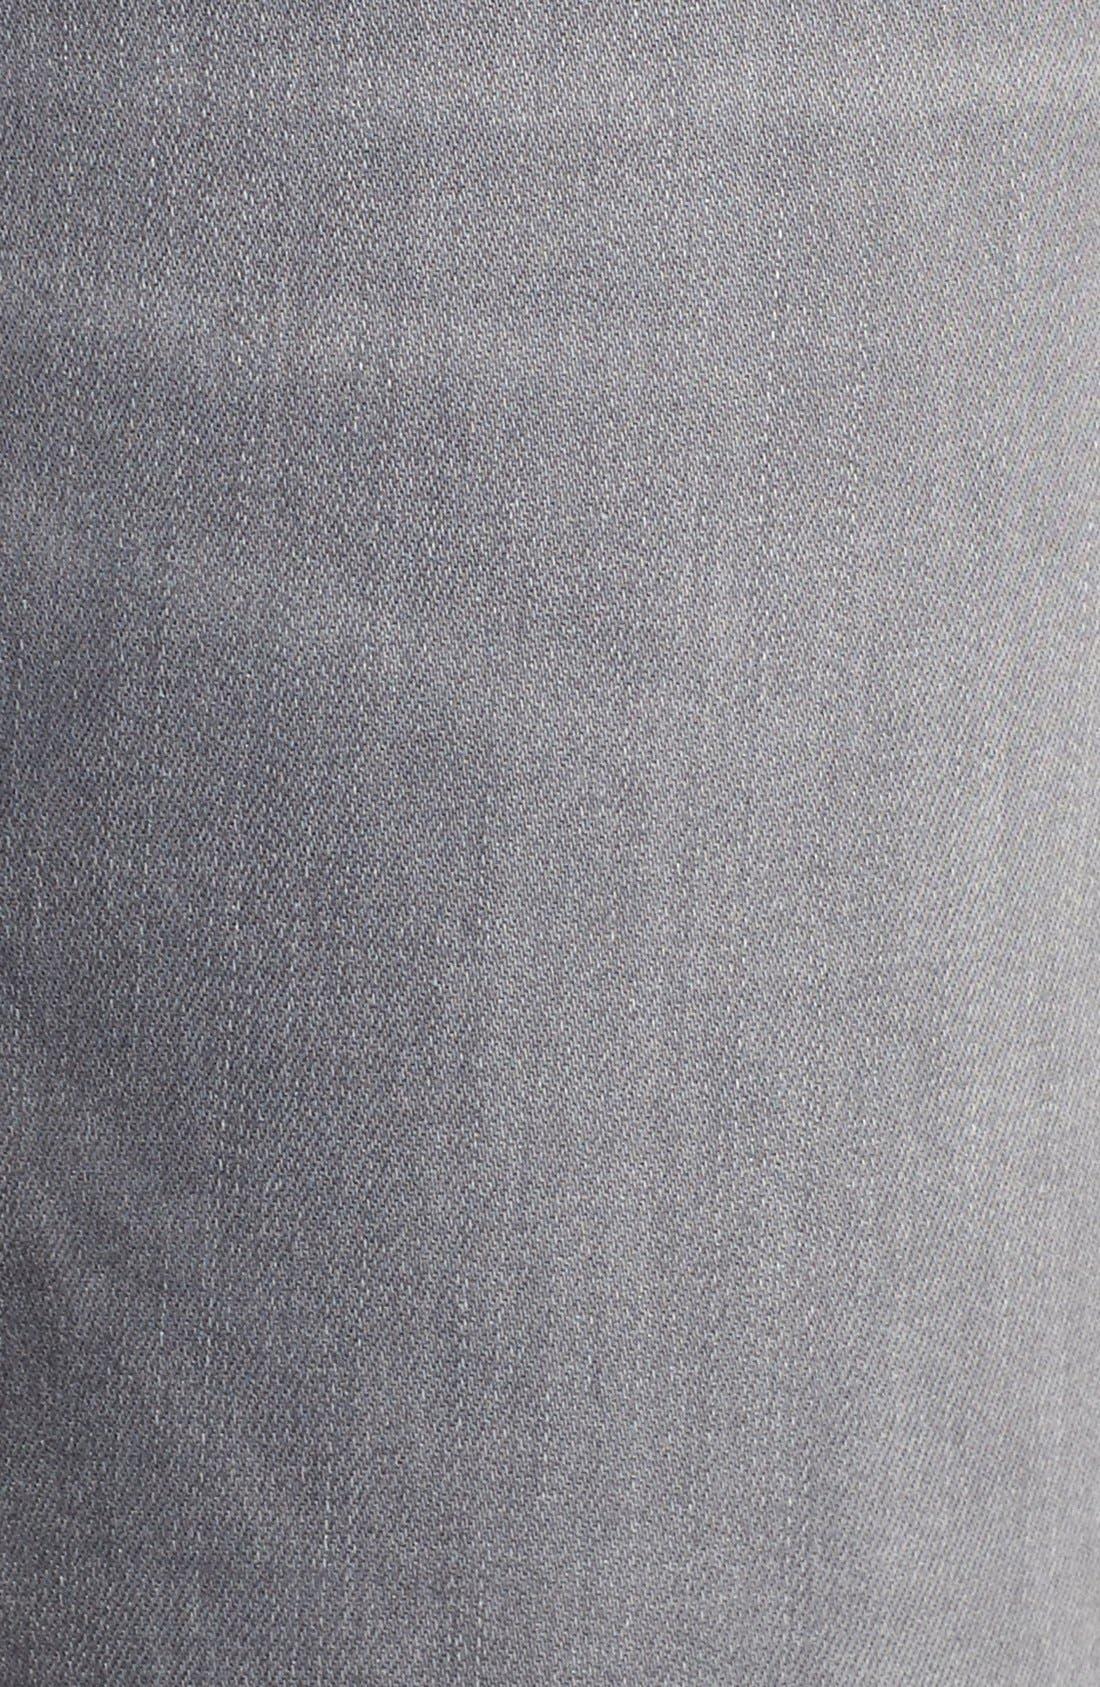 'Nico' Super Skinny Jeans,                             Alternate thumbnail 5, color,                             Spark Plug